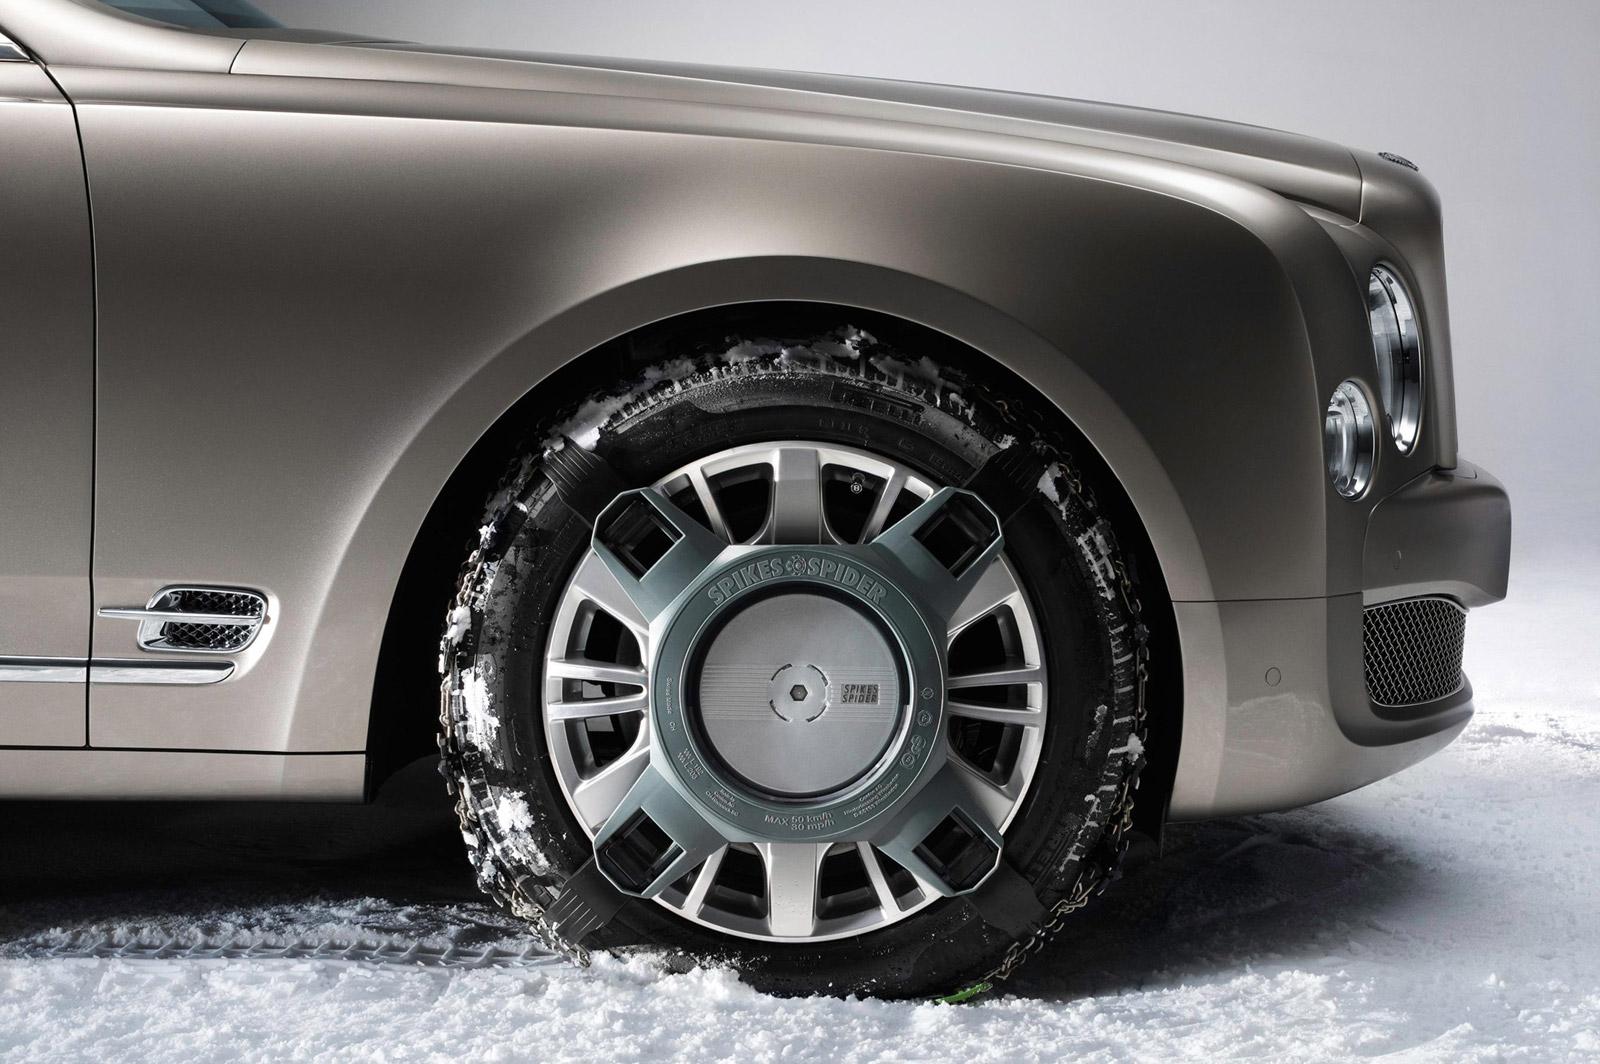 Mercedes-Benz E-Class: Snow chains